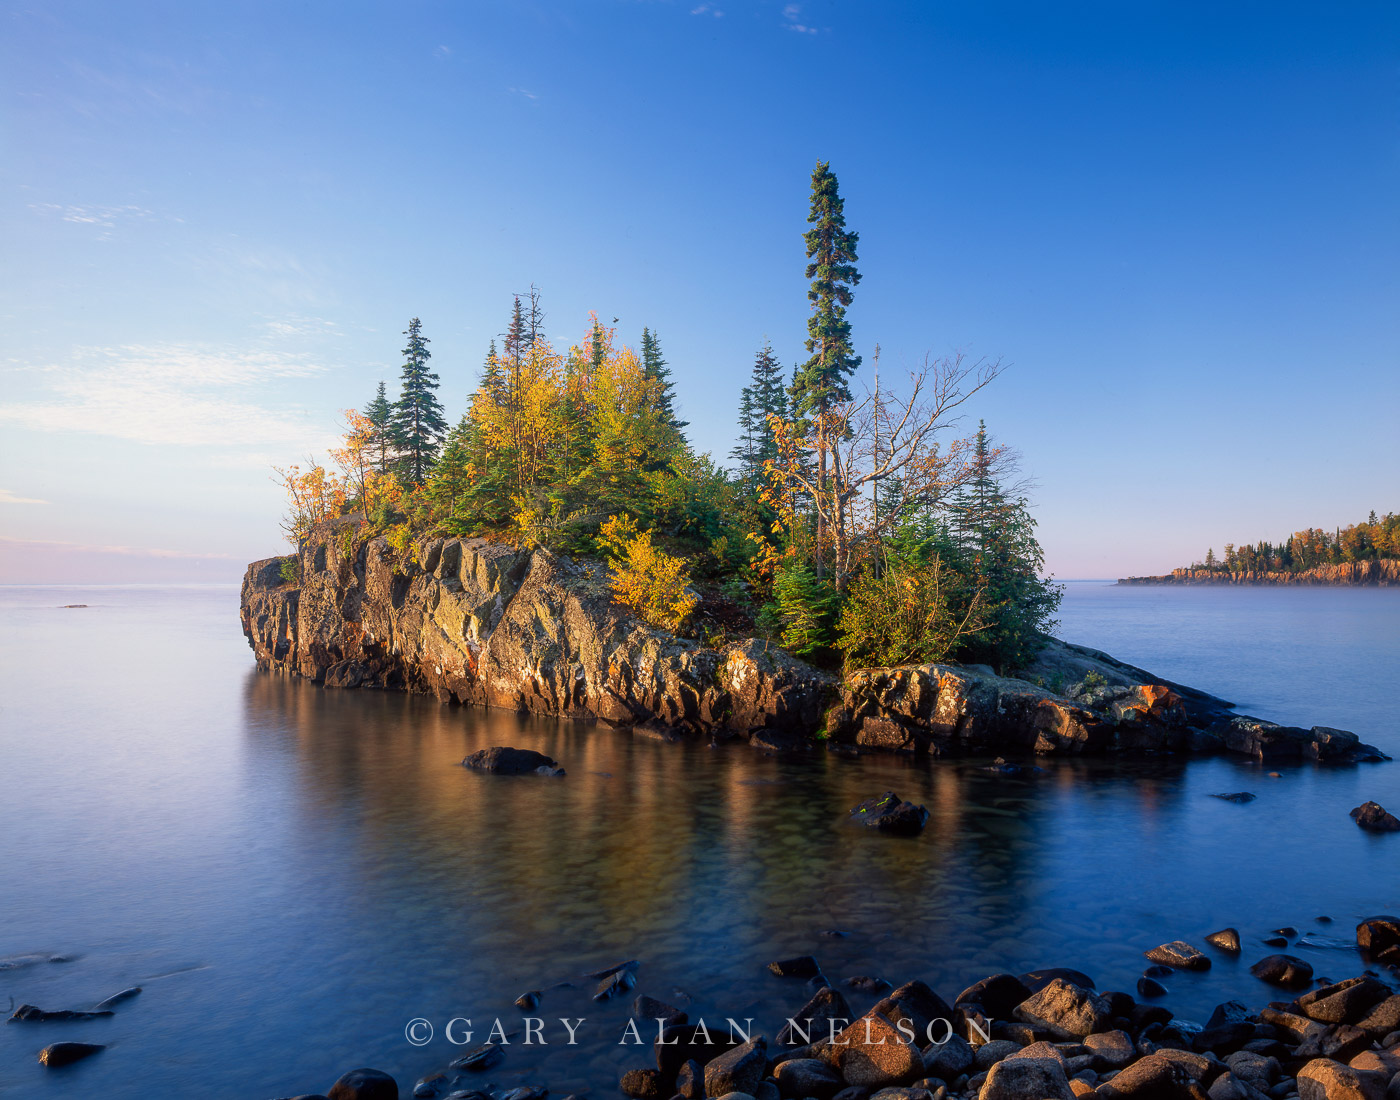 Island on the rugged shoreline of Lake Superior, Minnesota